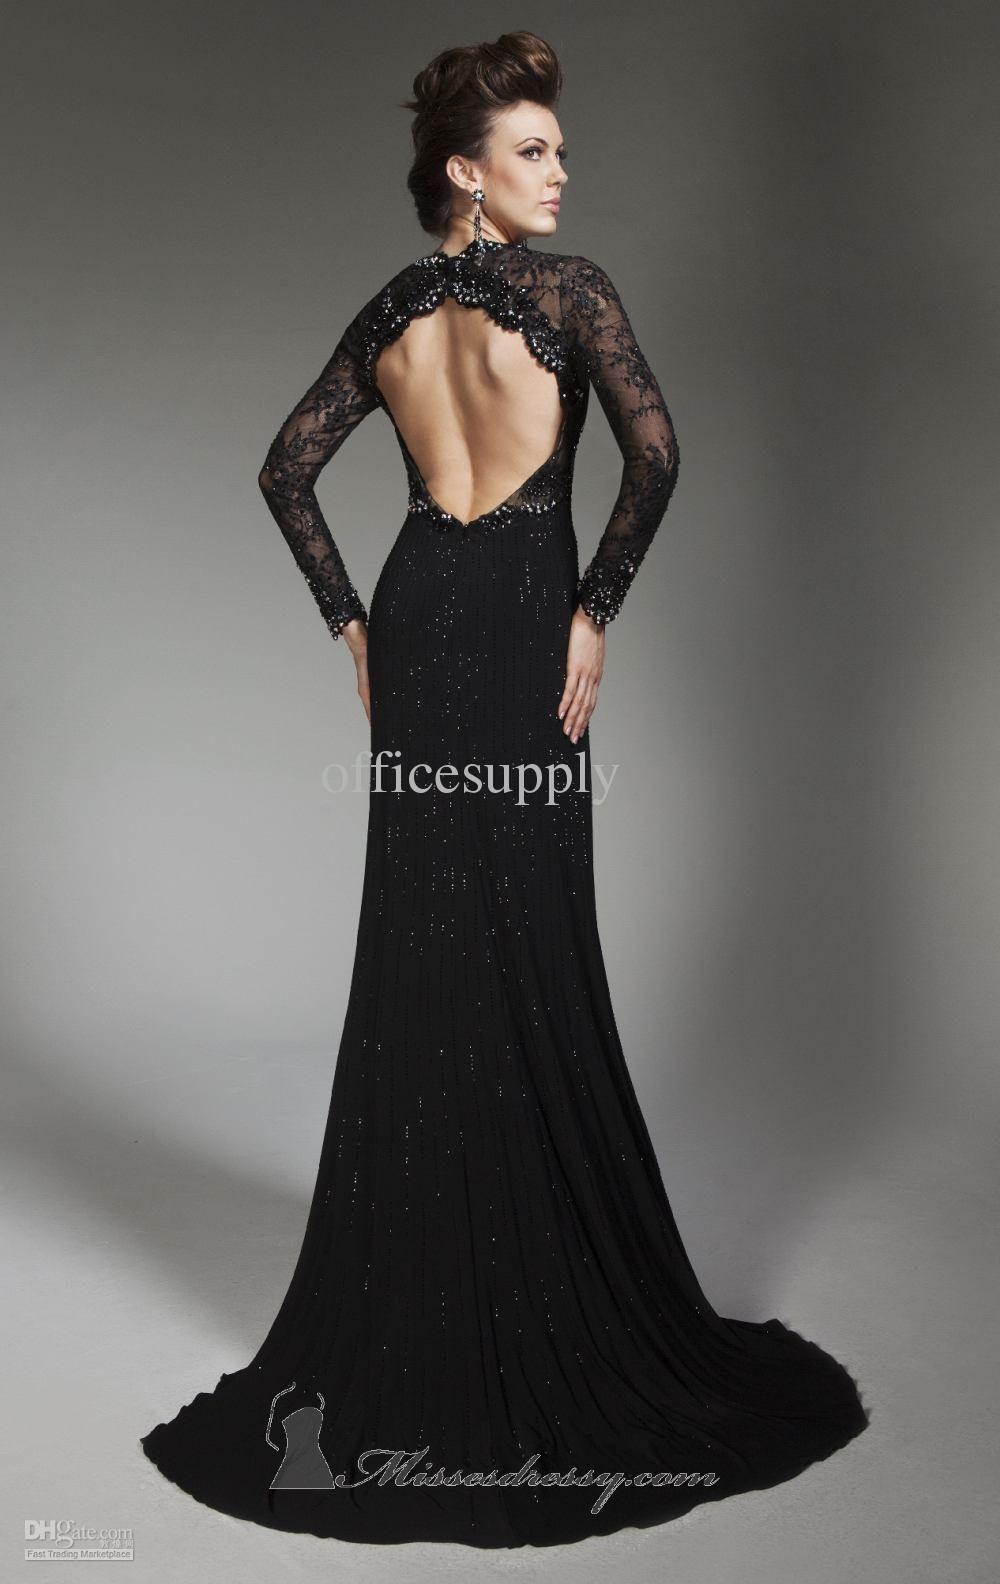 Formal Black Lace Dress Photo Album - Reikian